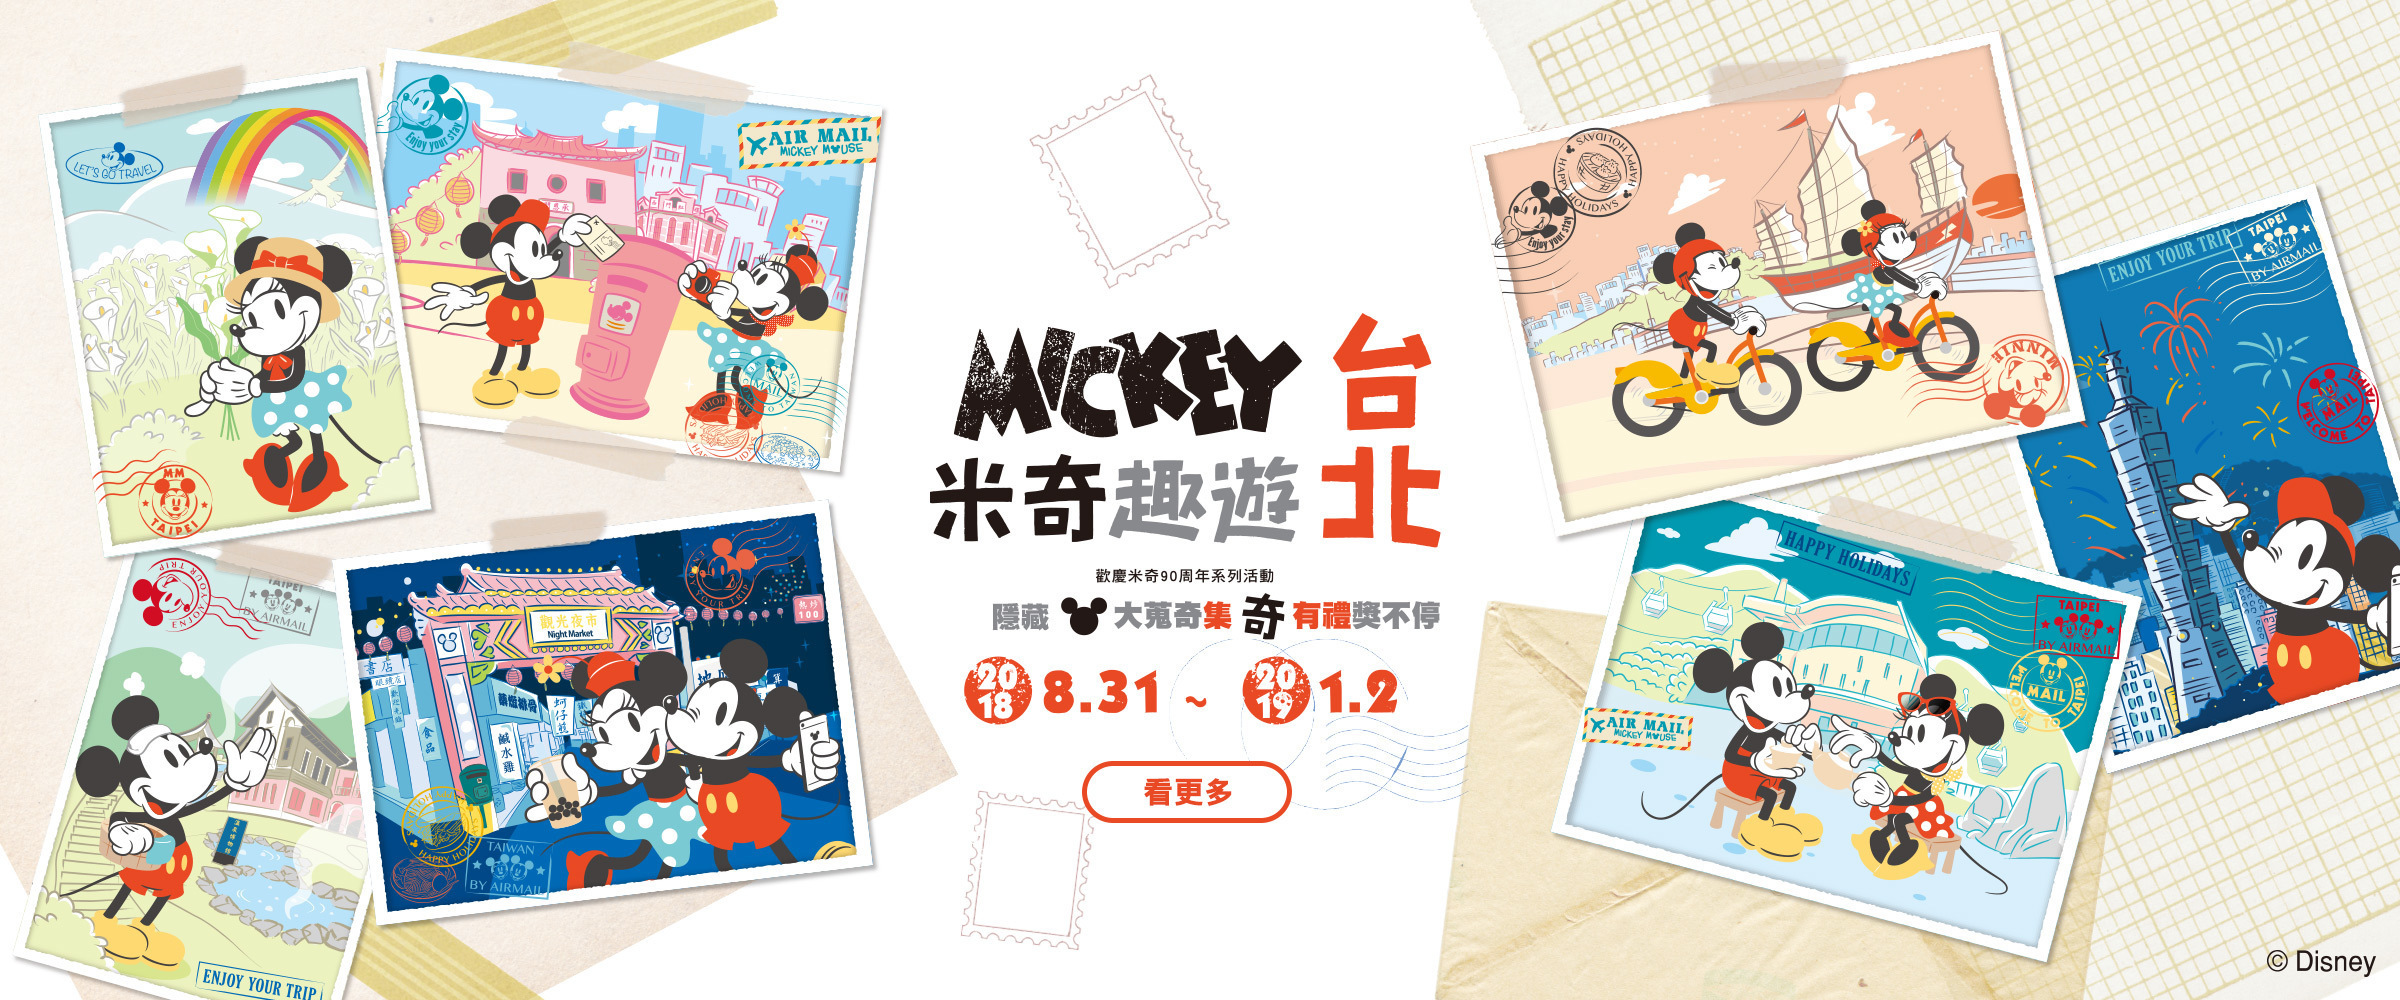 Finding Mickey Taipei | Homepage